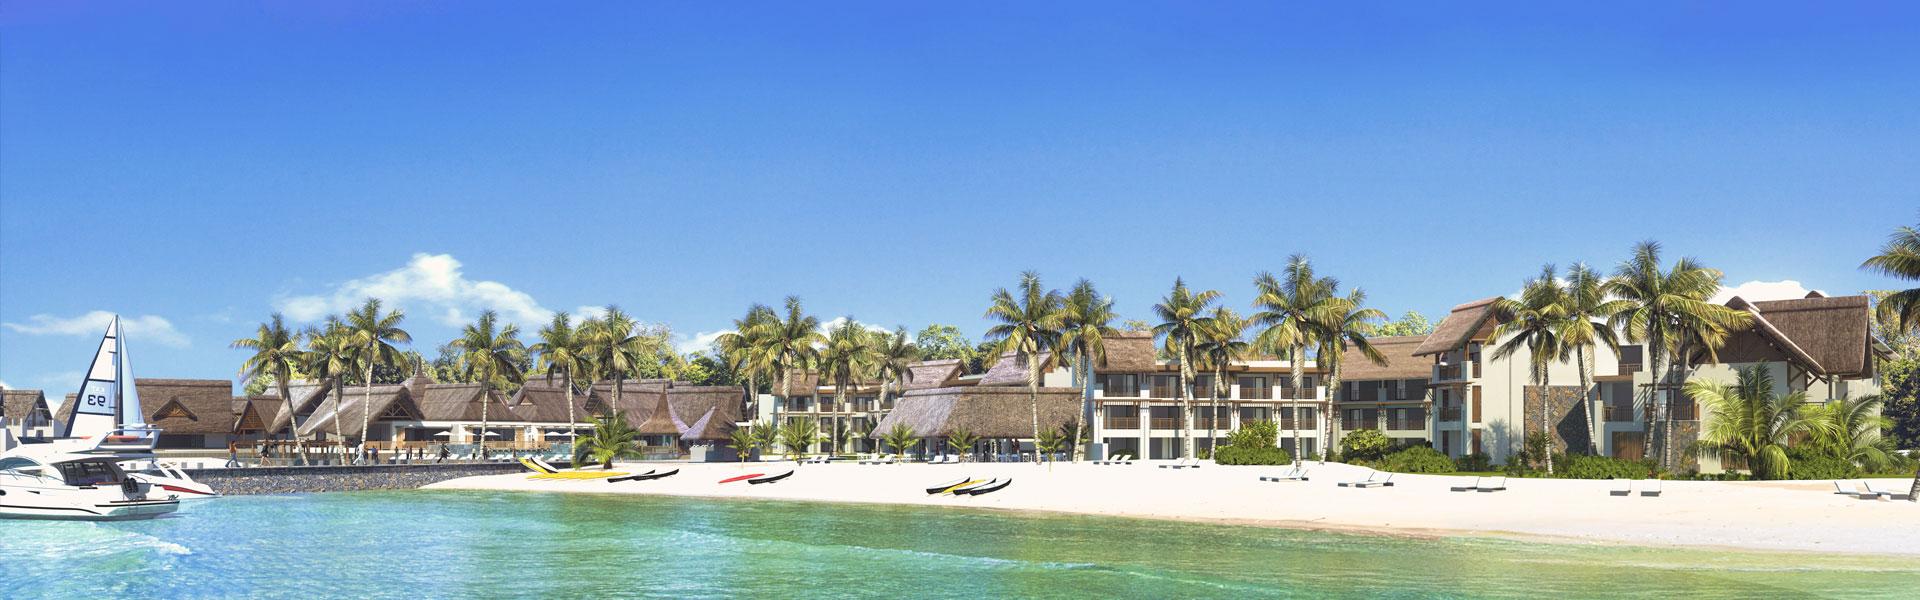 preskil_island_resort_restaurant_mauritius_1